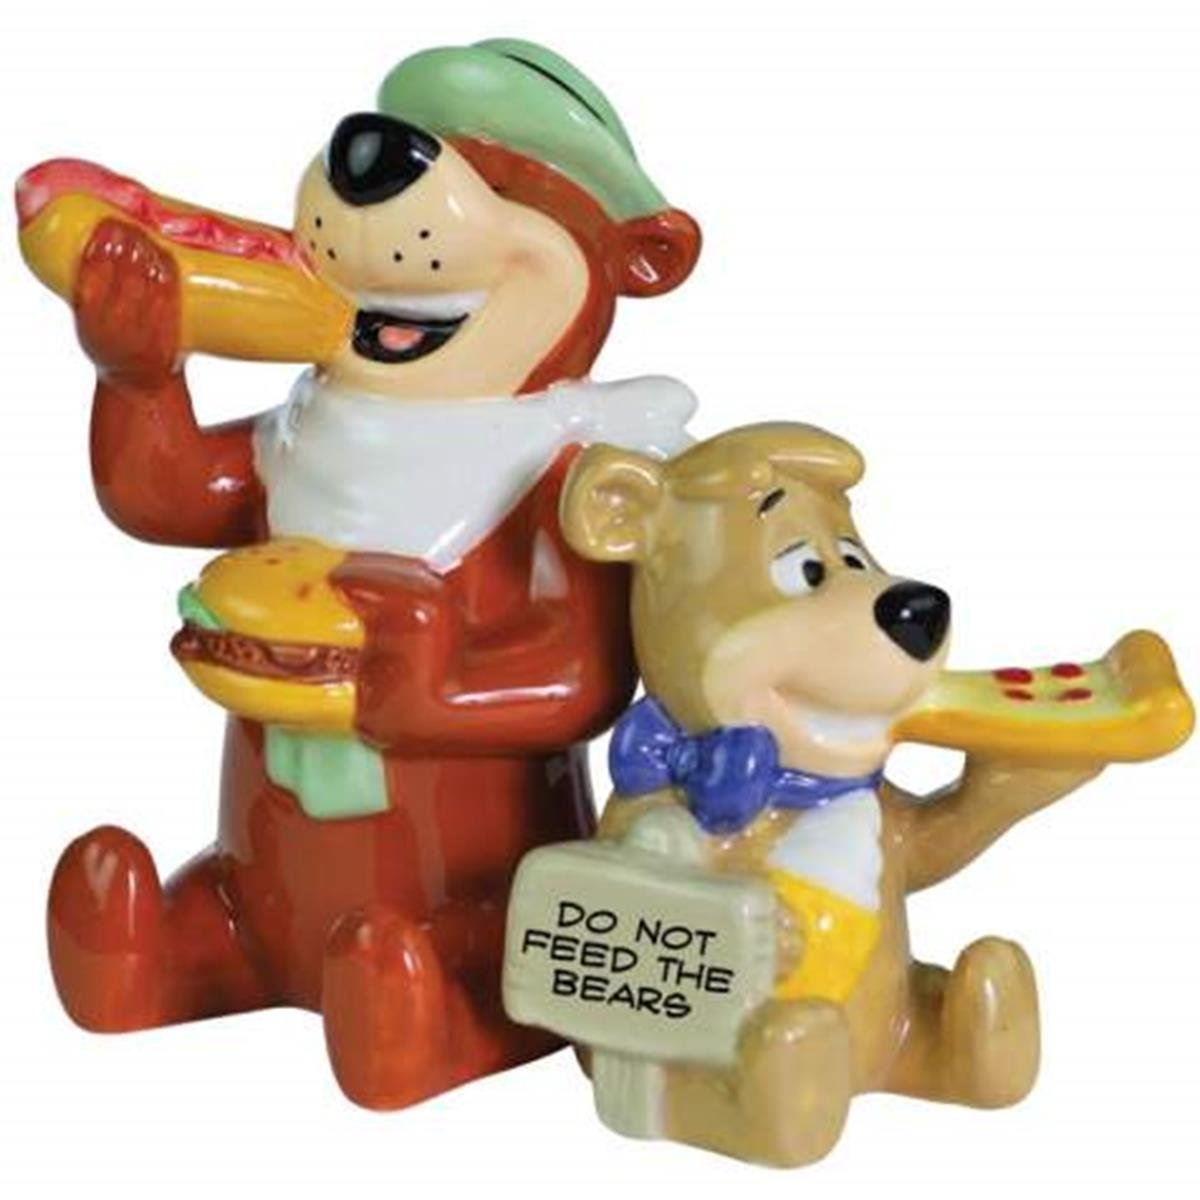 Yogi and Boo-Boo Bear Eating Cartoon Salt and Pepper Shakers